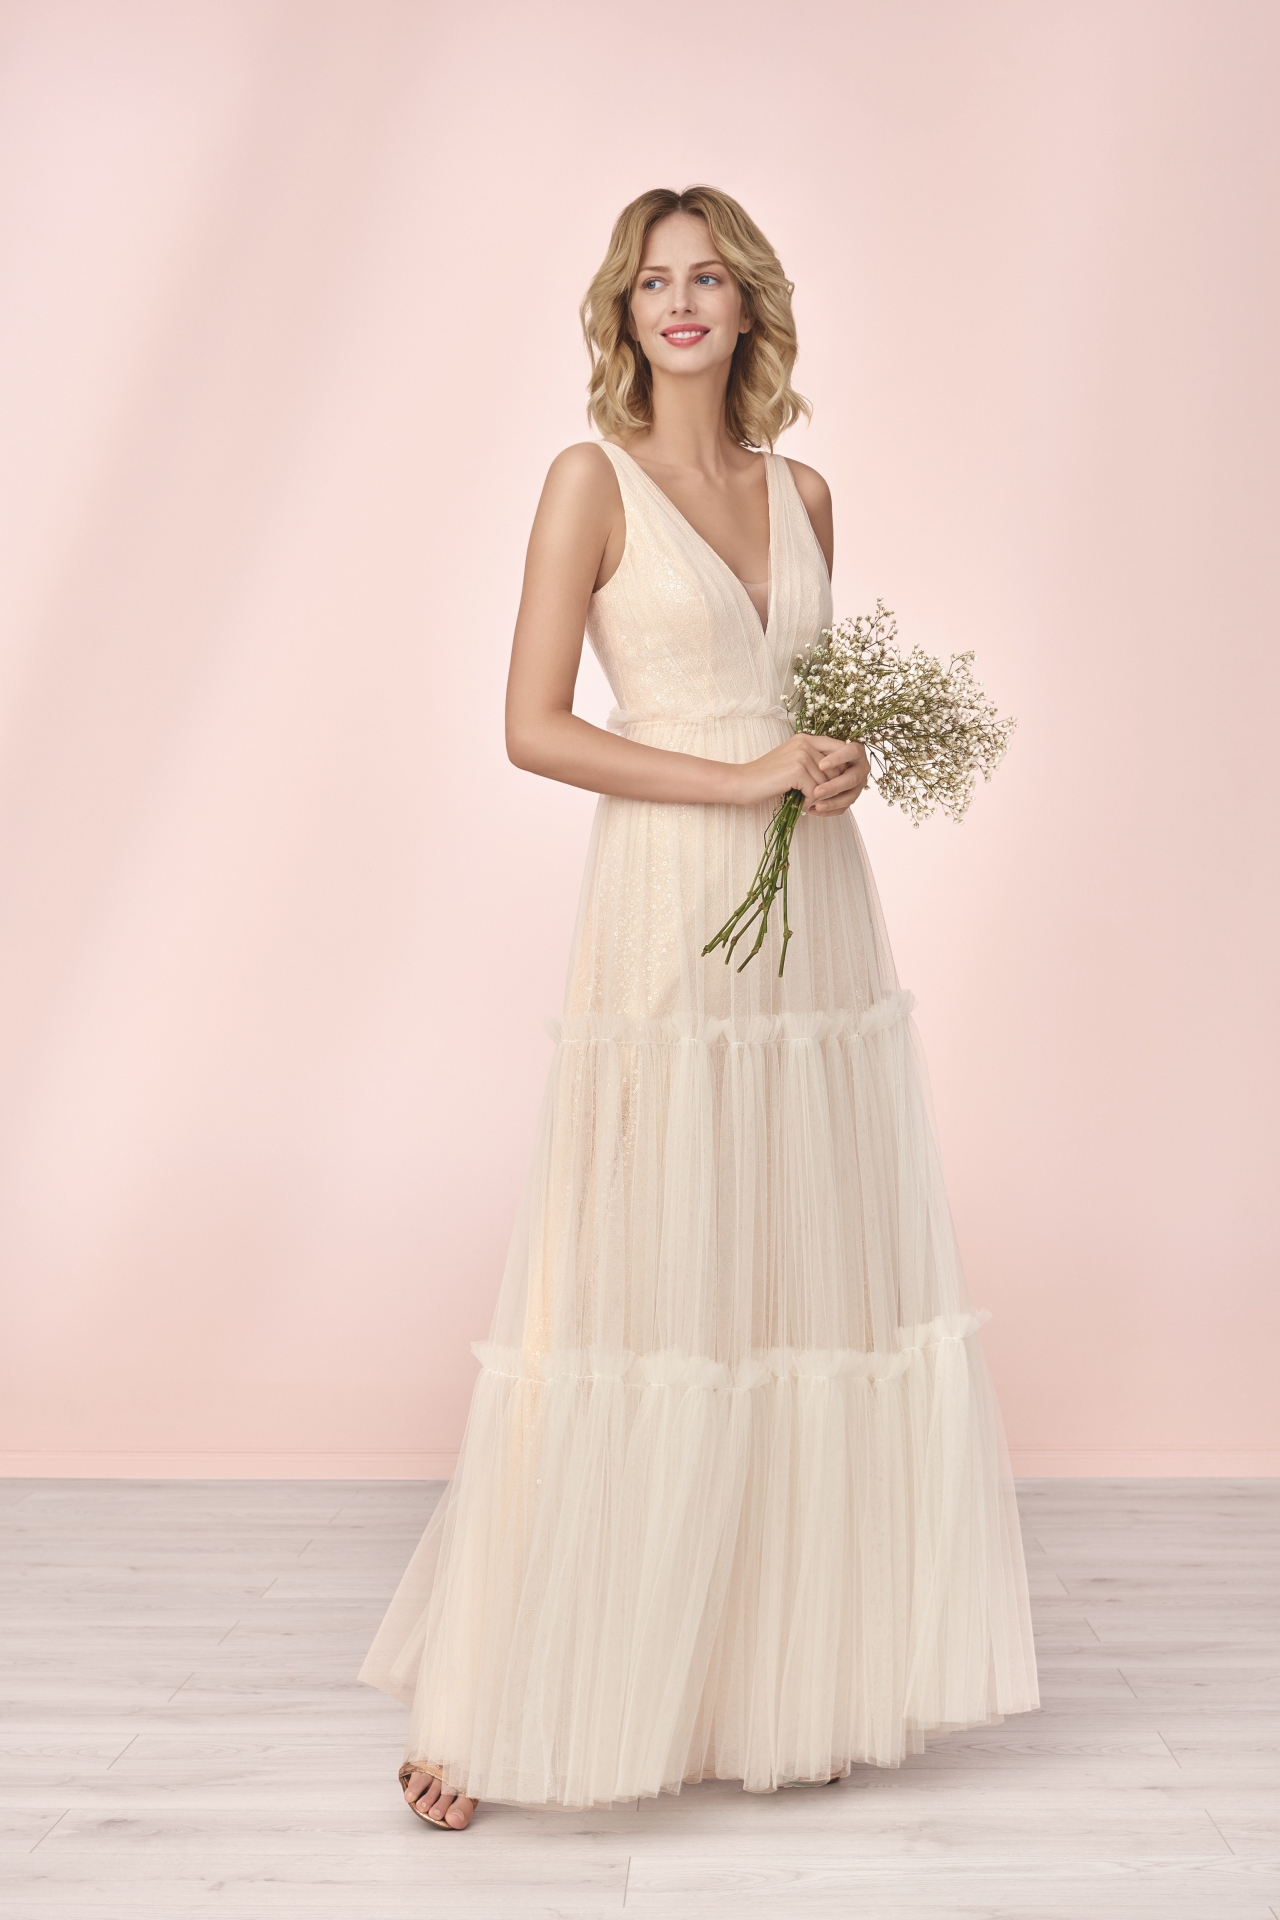 Brautkleid Elizabeth Konin 2019 - 4122T-1